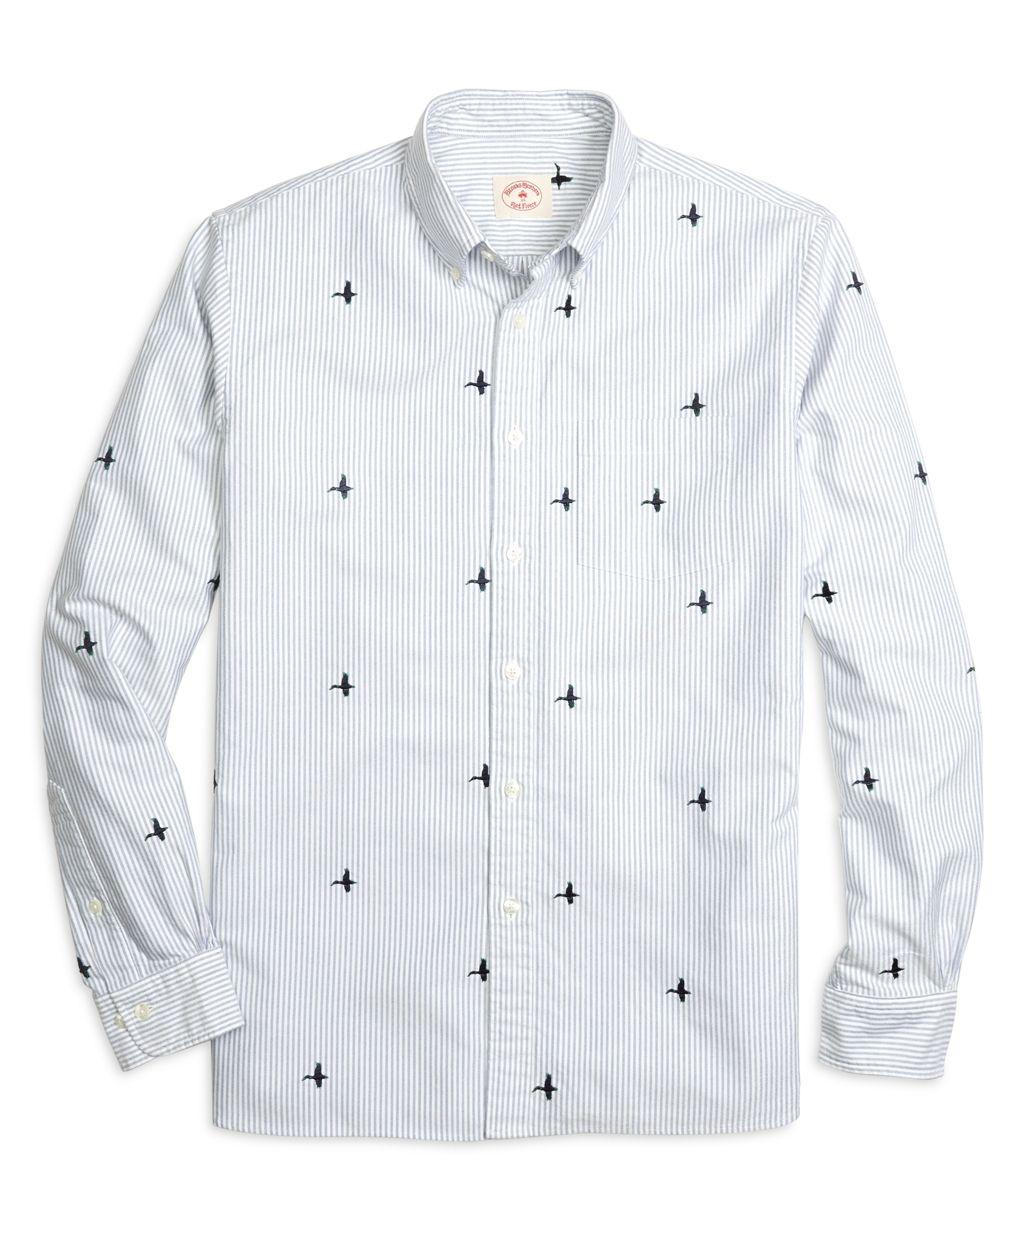 1fca23543b5 Men's Blue Mallard Duck Embroidered Striped Sport Shirt   Brooks Brothers